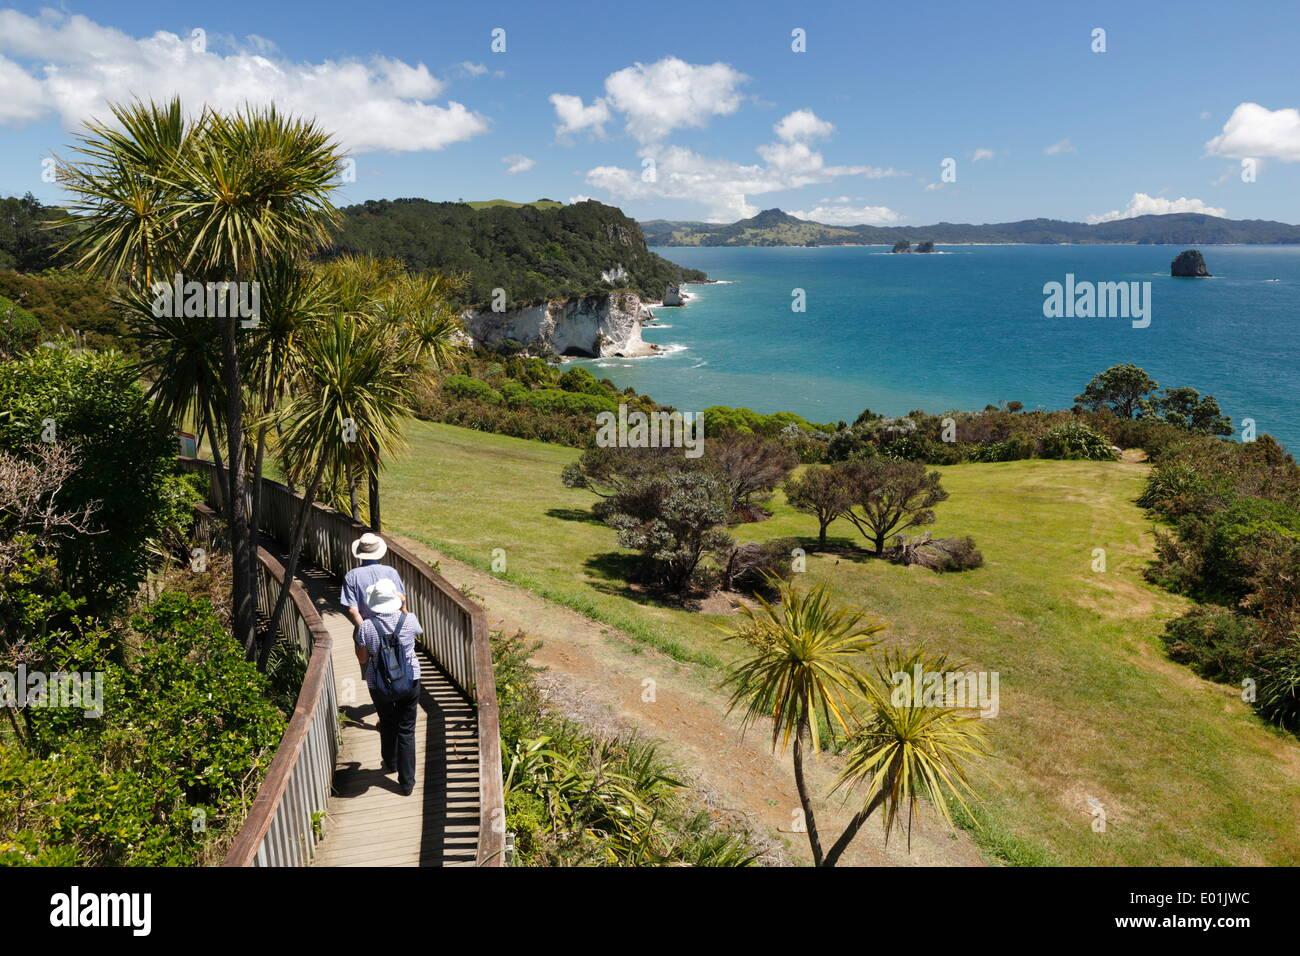 View along Cathedral Cove Recreational Reserve, Hahei, Coromandel Peninsula, Waikato, North Island, New Zealand, Pacific - Stock Image